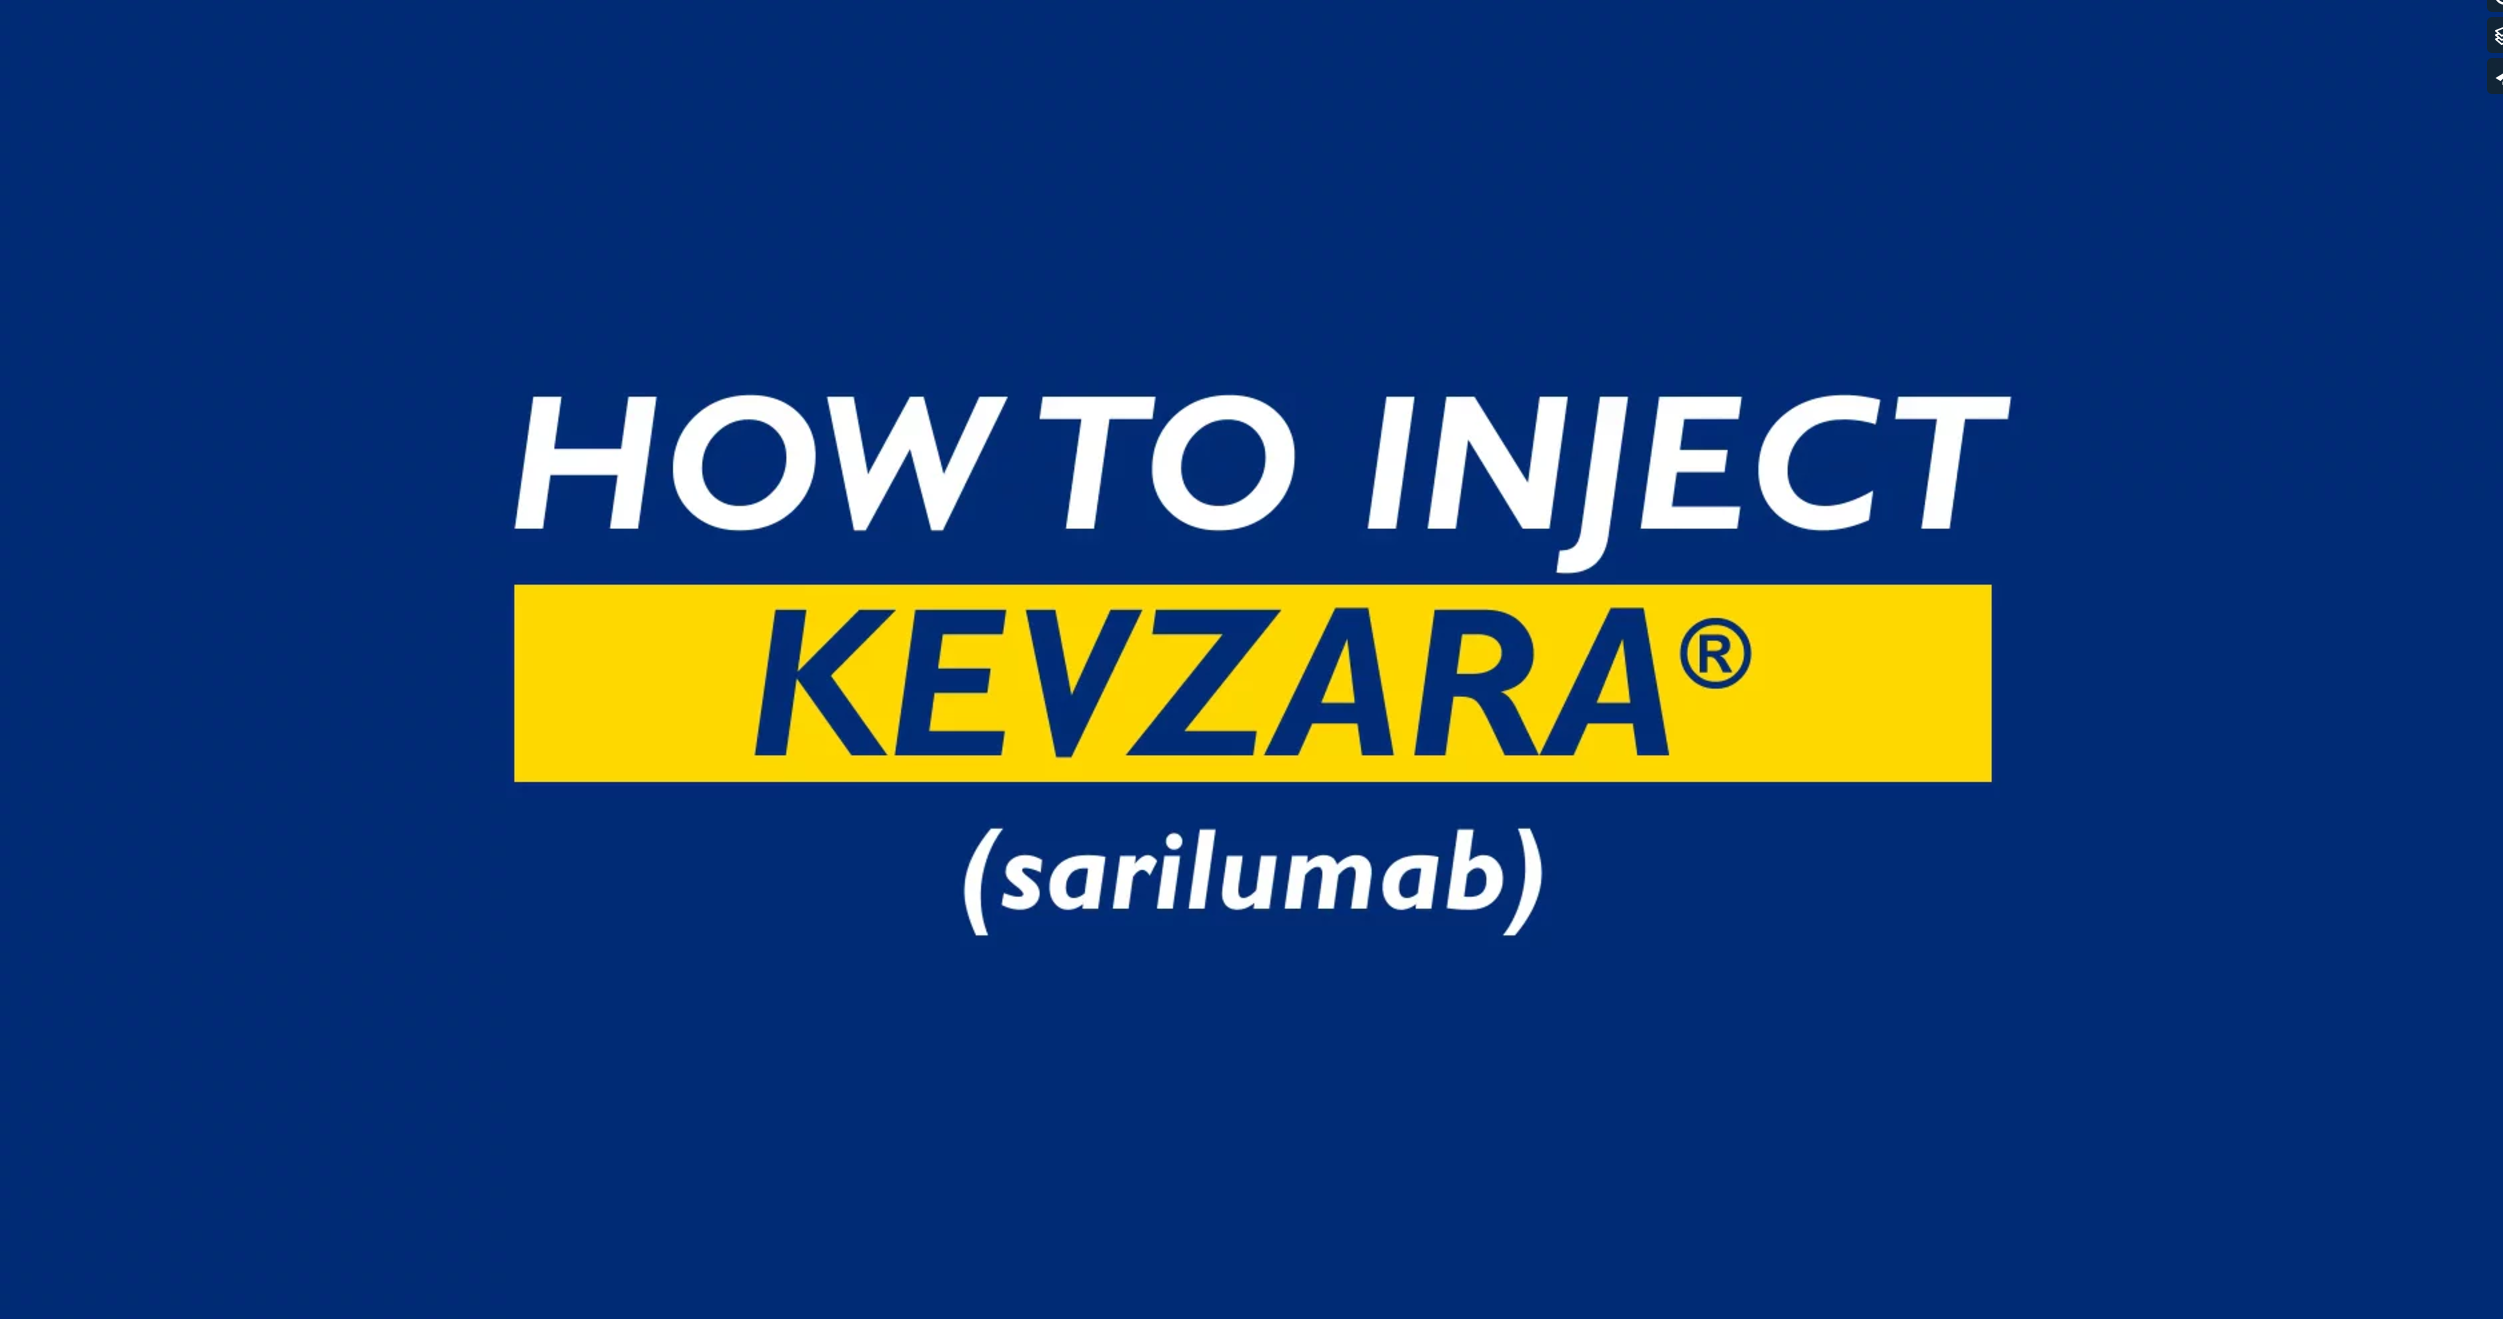 How To Inject Kevzara (sarilumab)